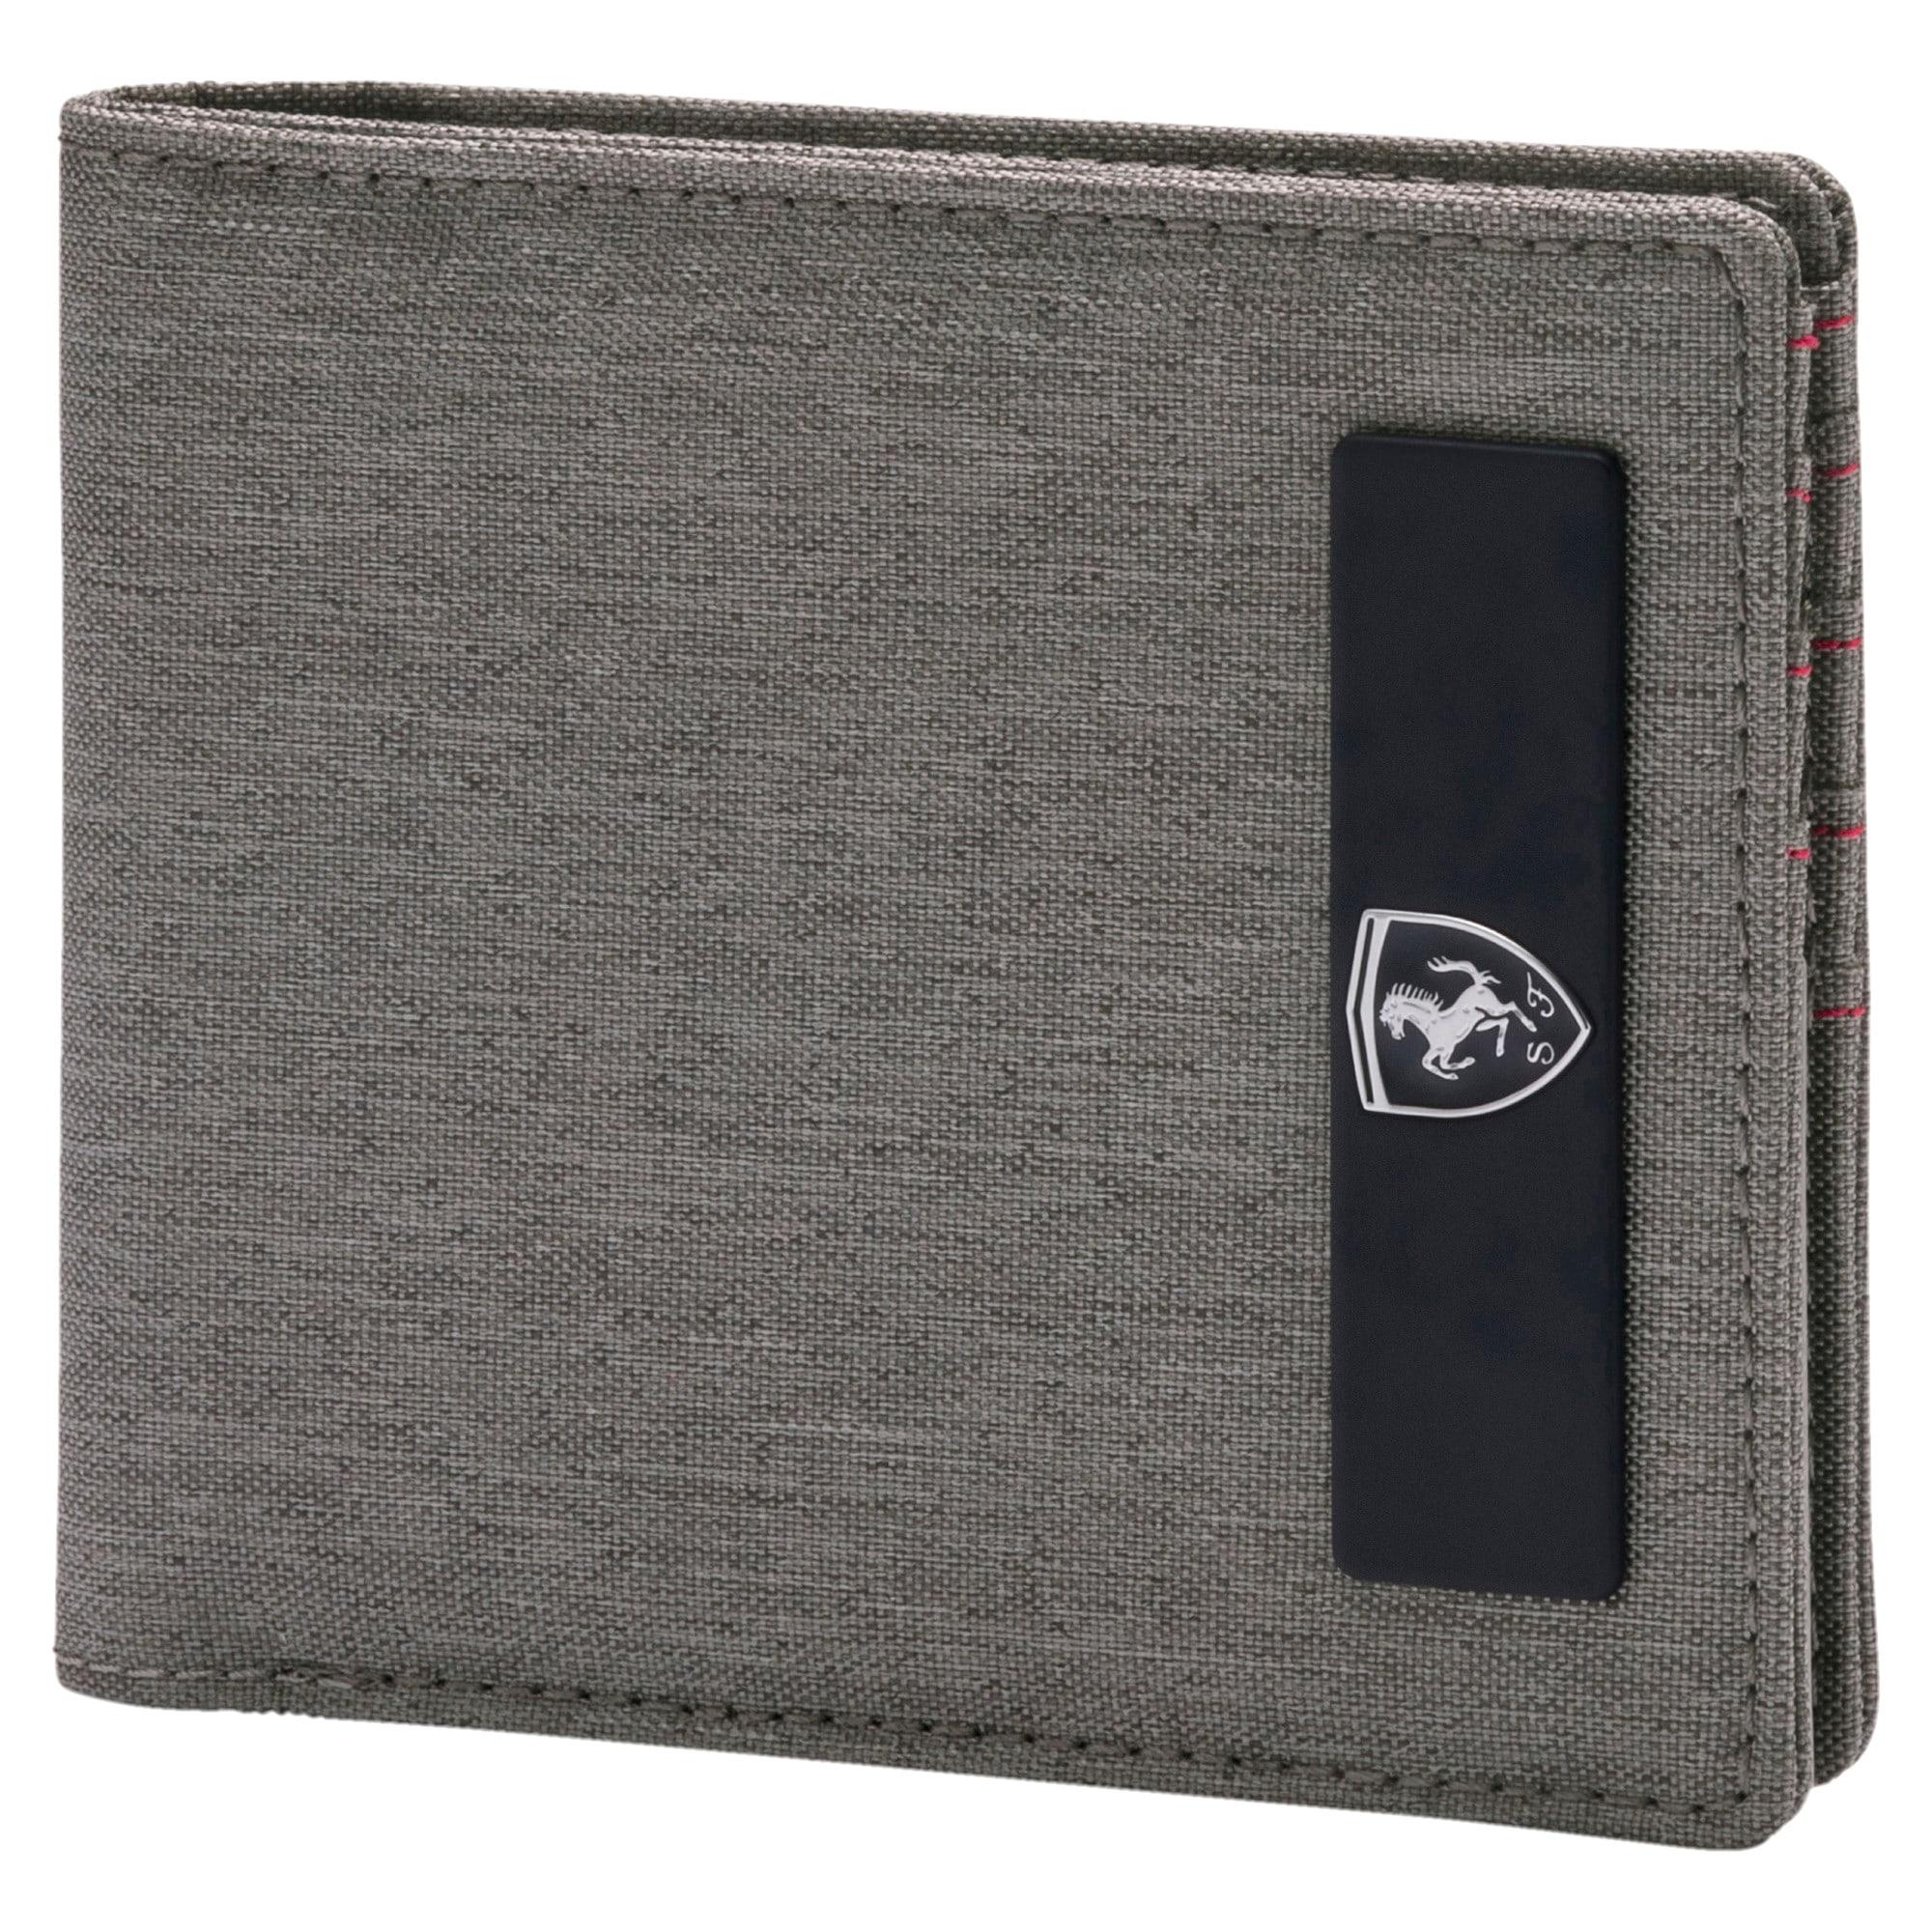 Thumbnail 1 of Ferrari Lifestyle Wallet, Charcoal Gray, medium-IND